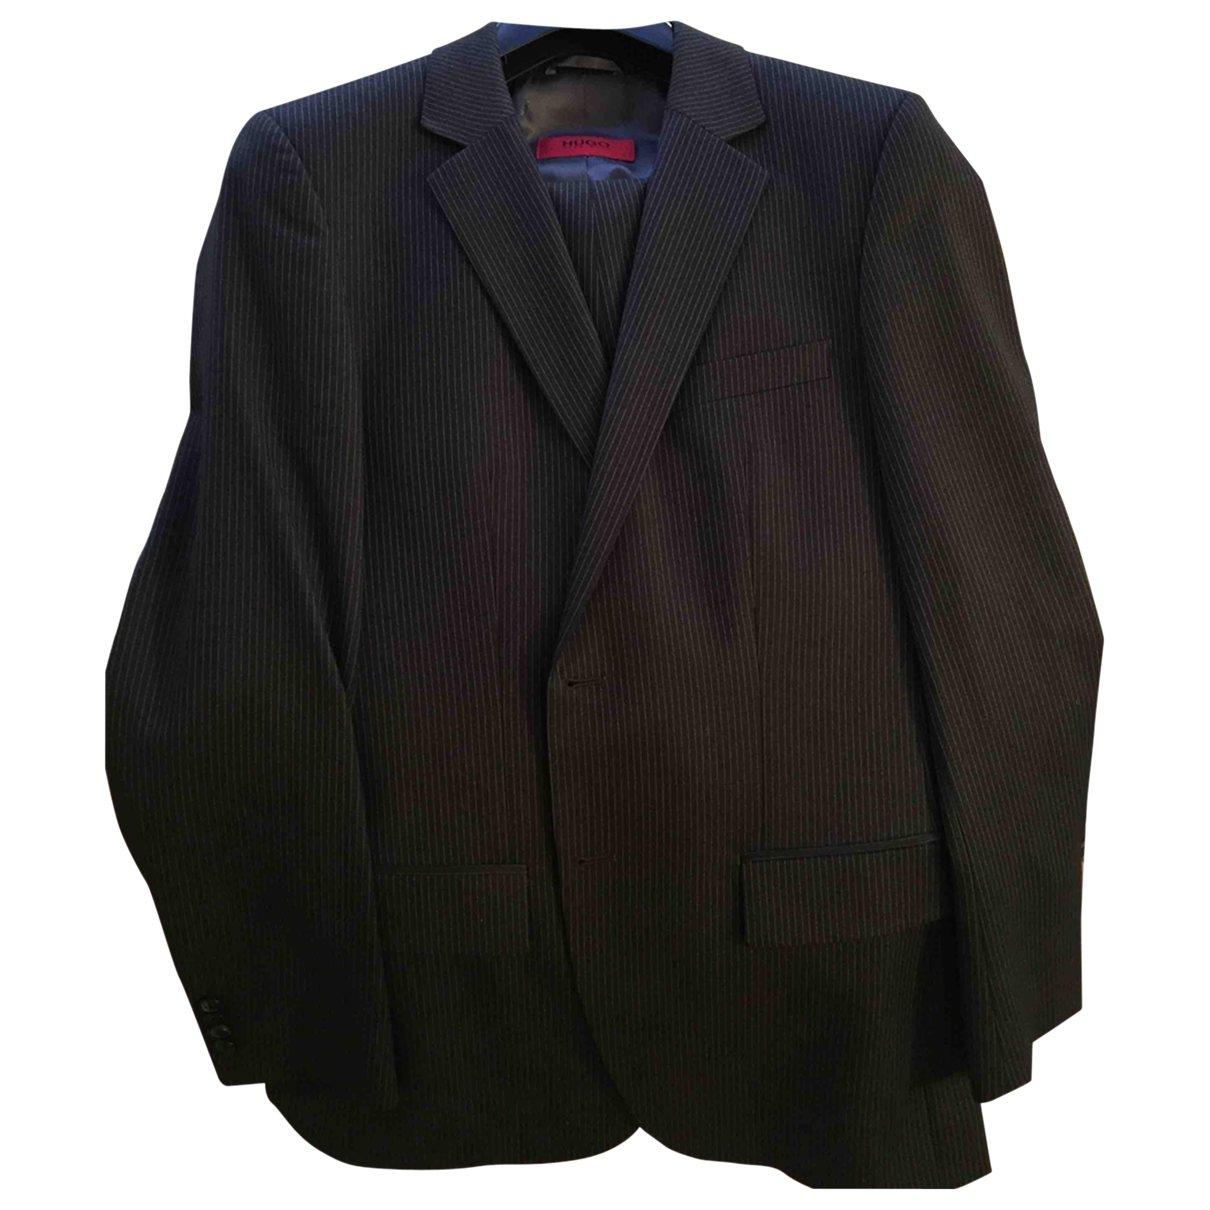 Hugo Boss \N Grey Wool Suits for Men 38 UK - US